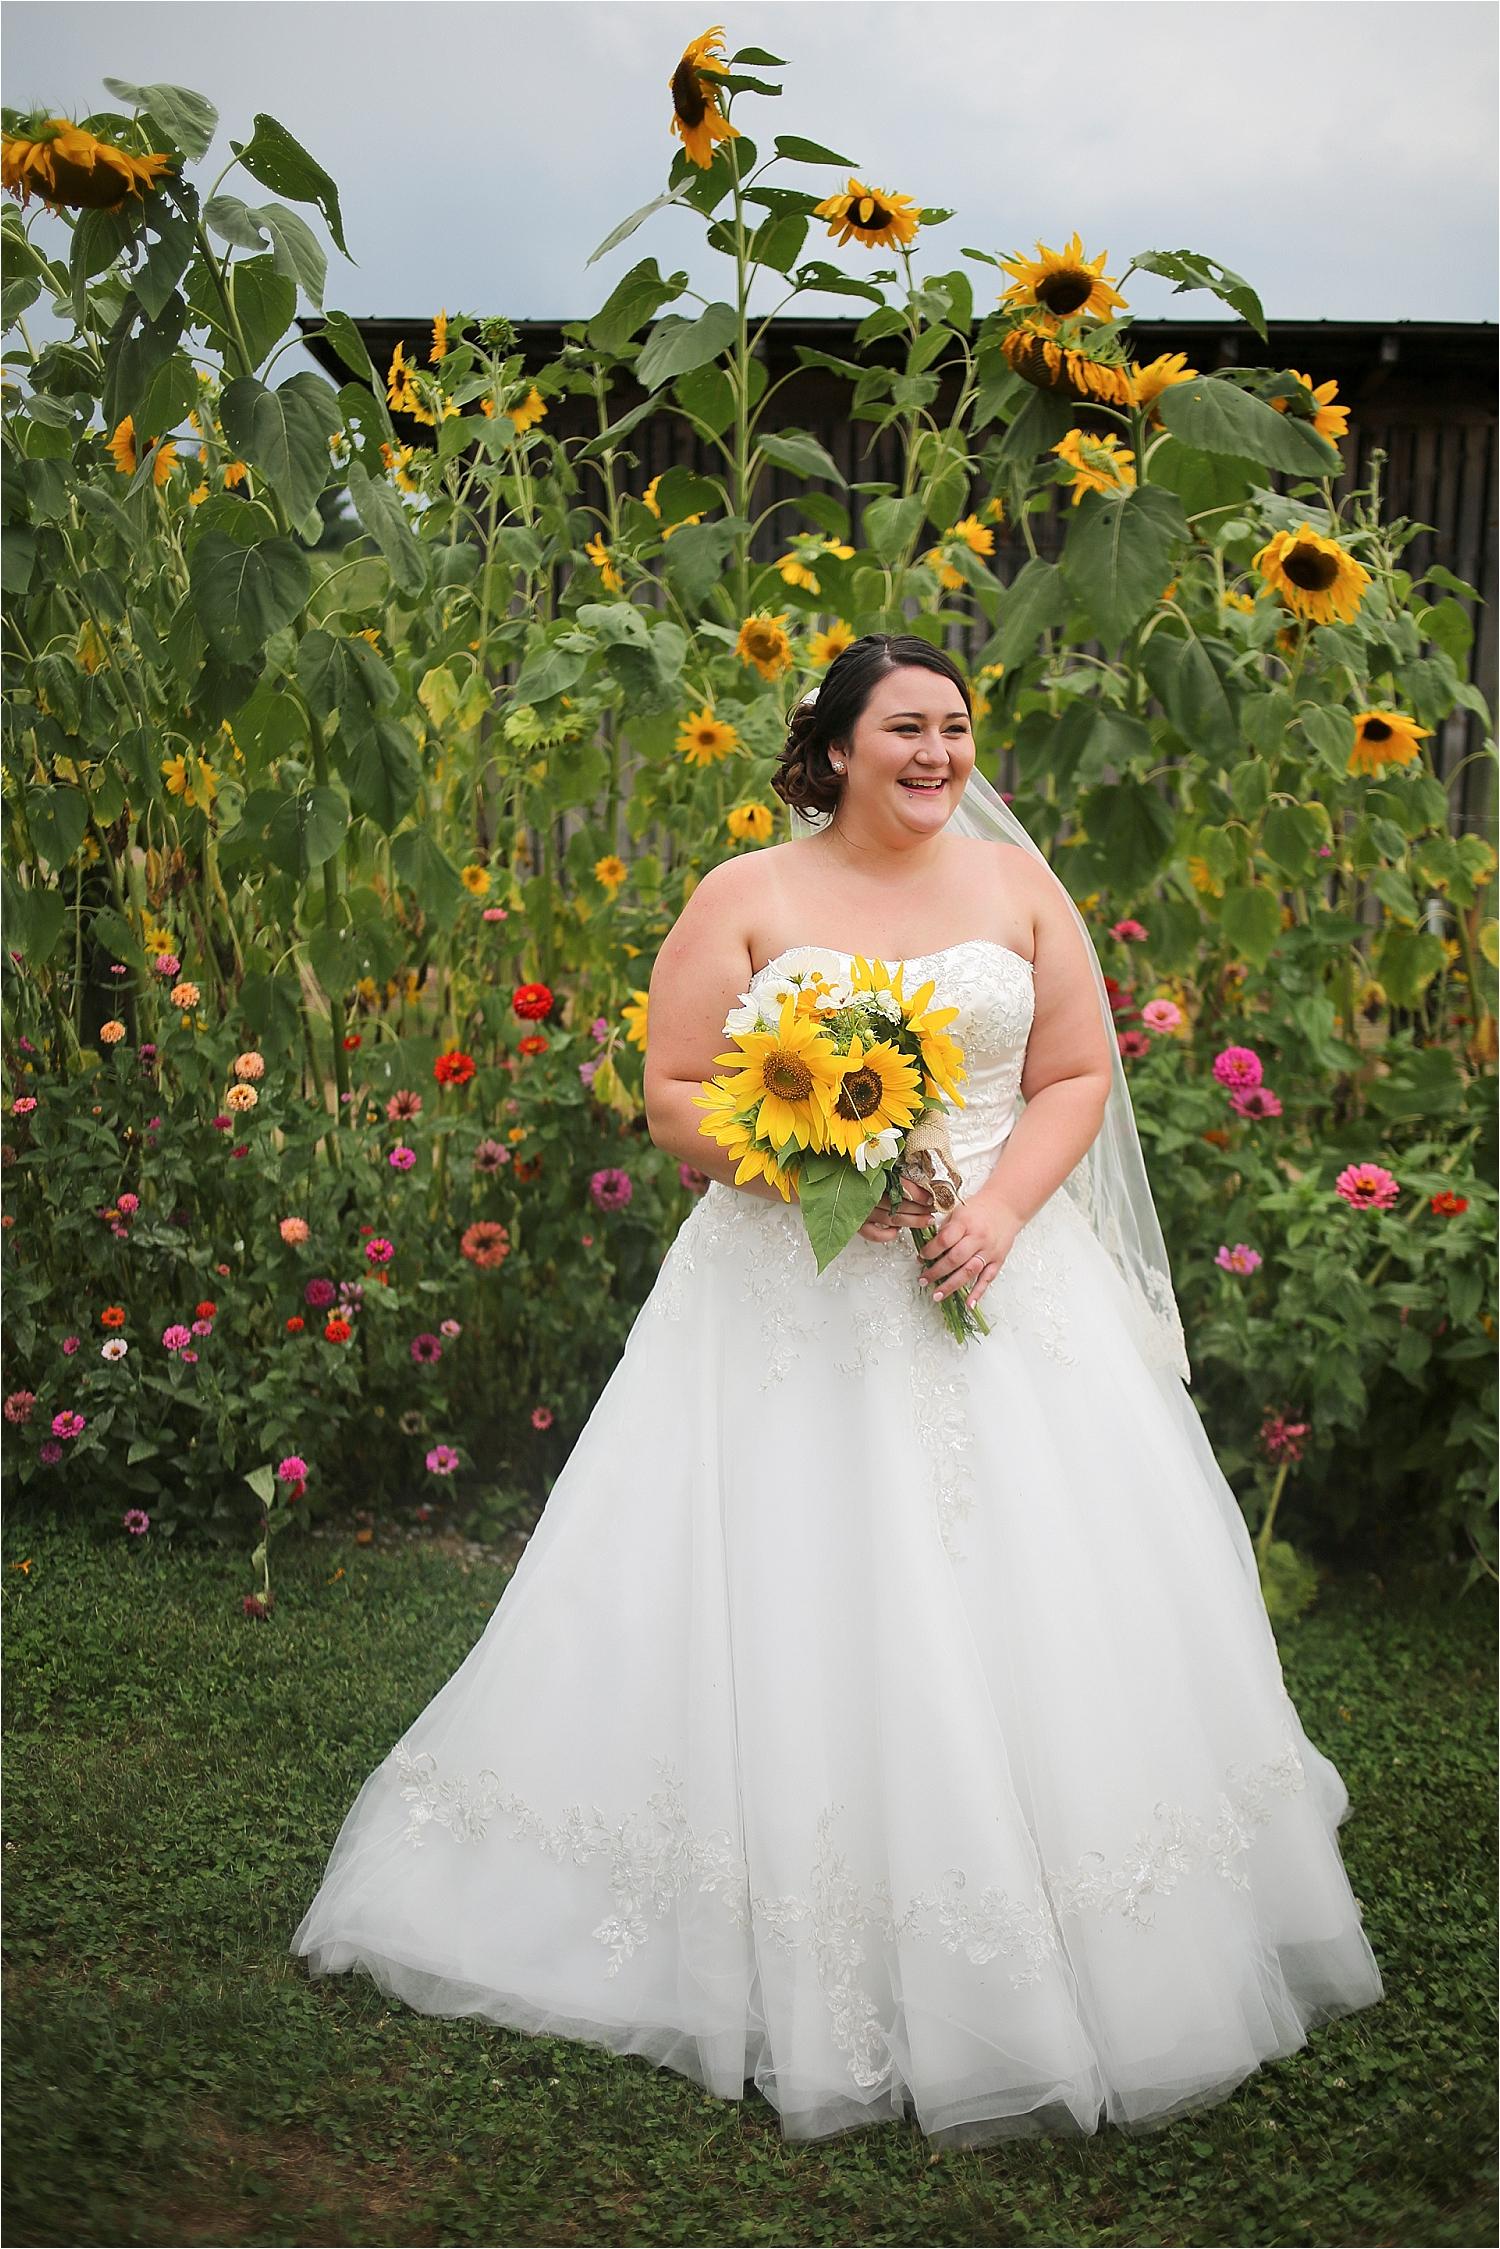 Blacksburg-Wedding-Photographer-_0017.jpg